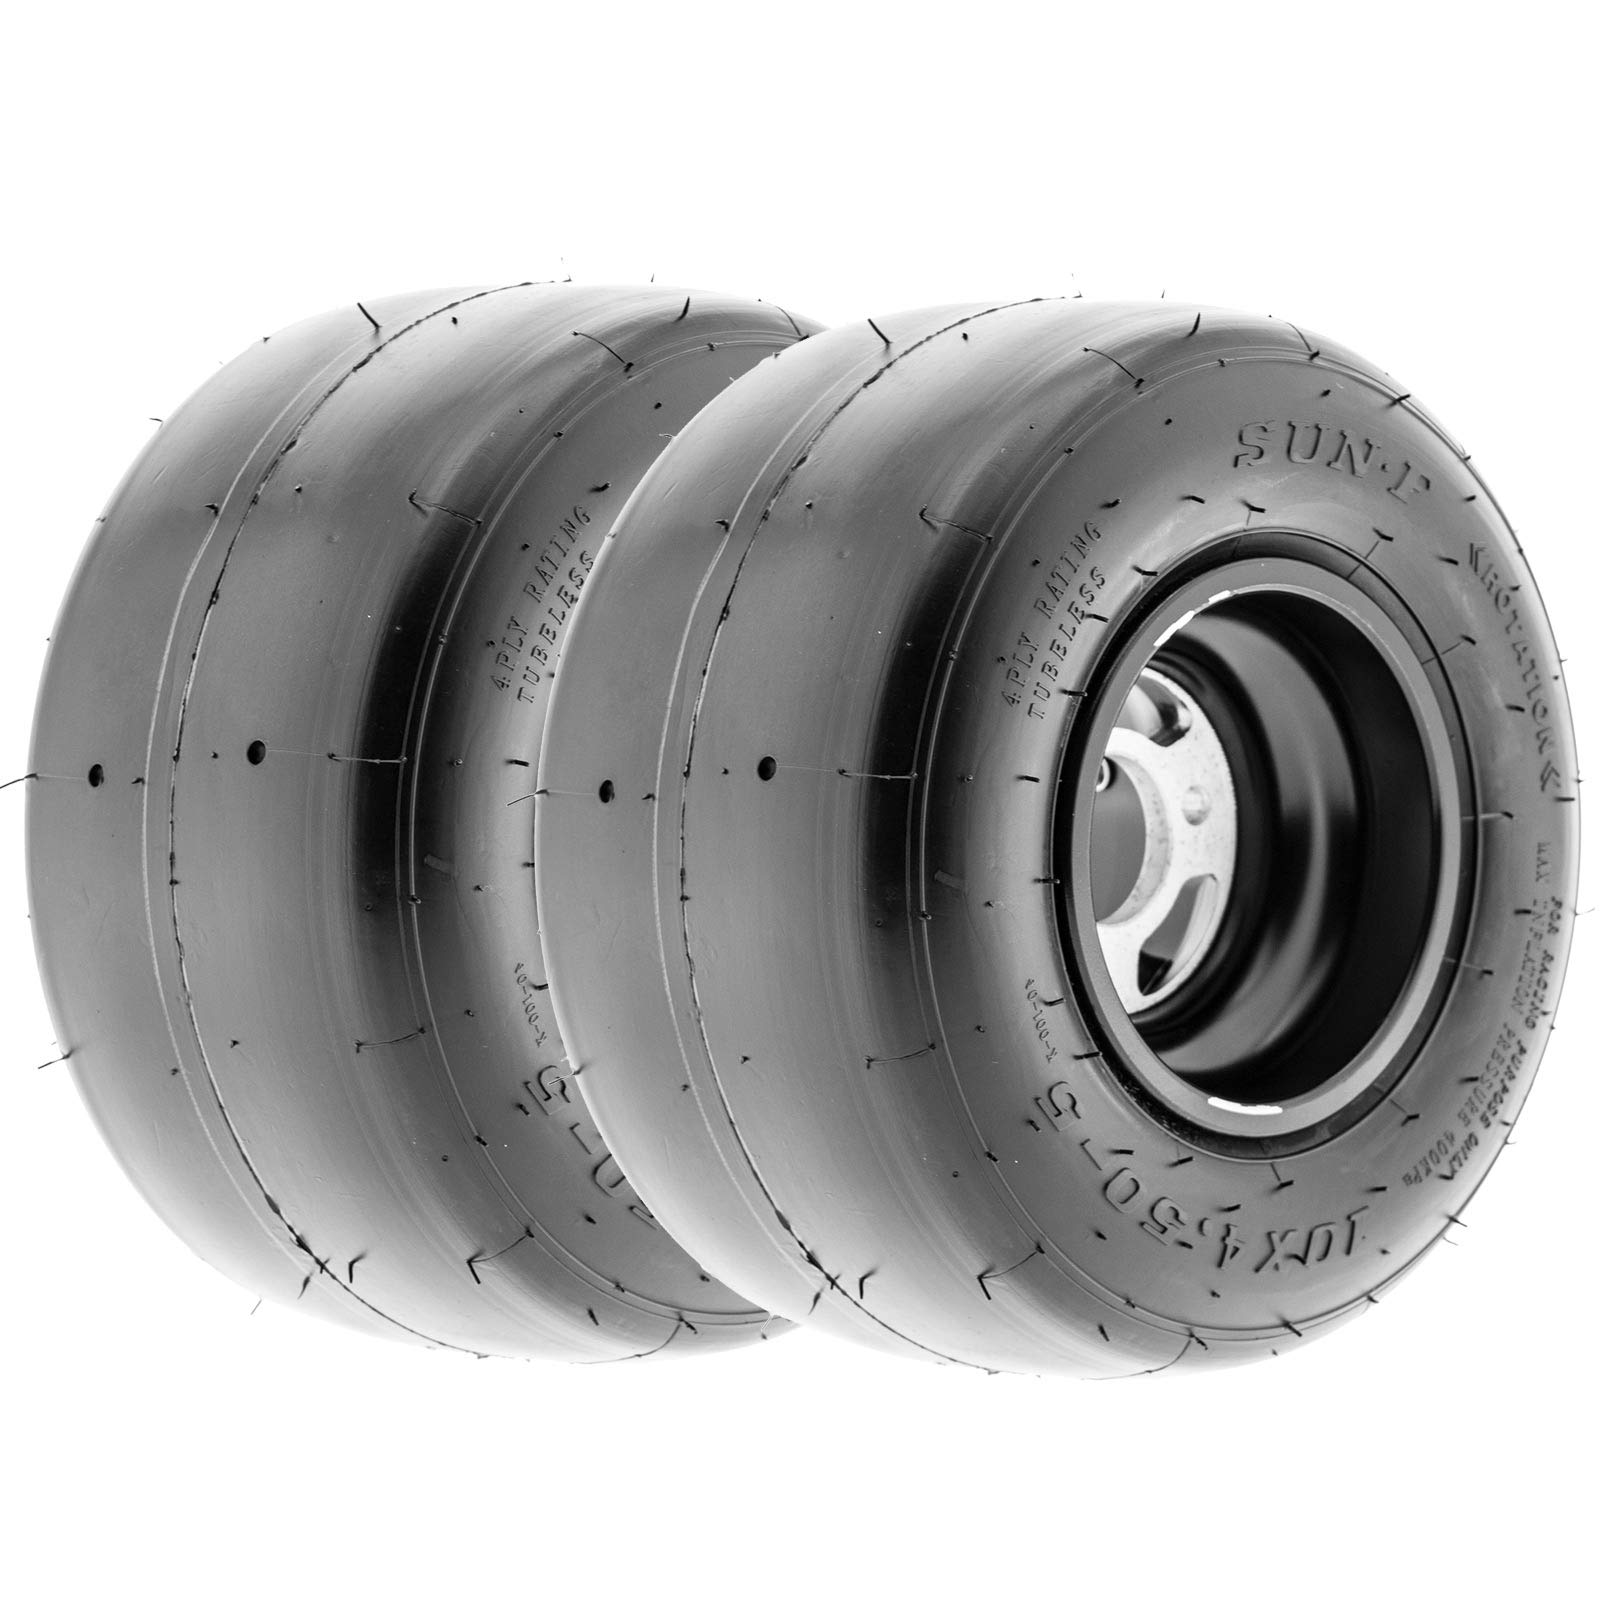 SunF 10x4.5.00-5 4 Ply ATV UTV A/T Tires K001, [Set pair of 2]